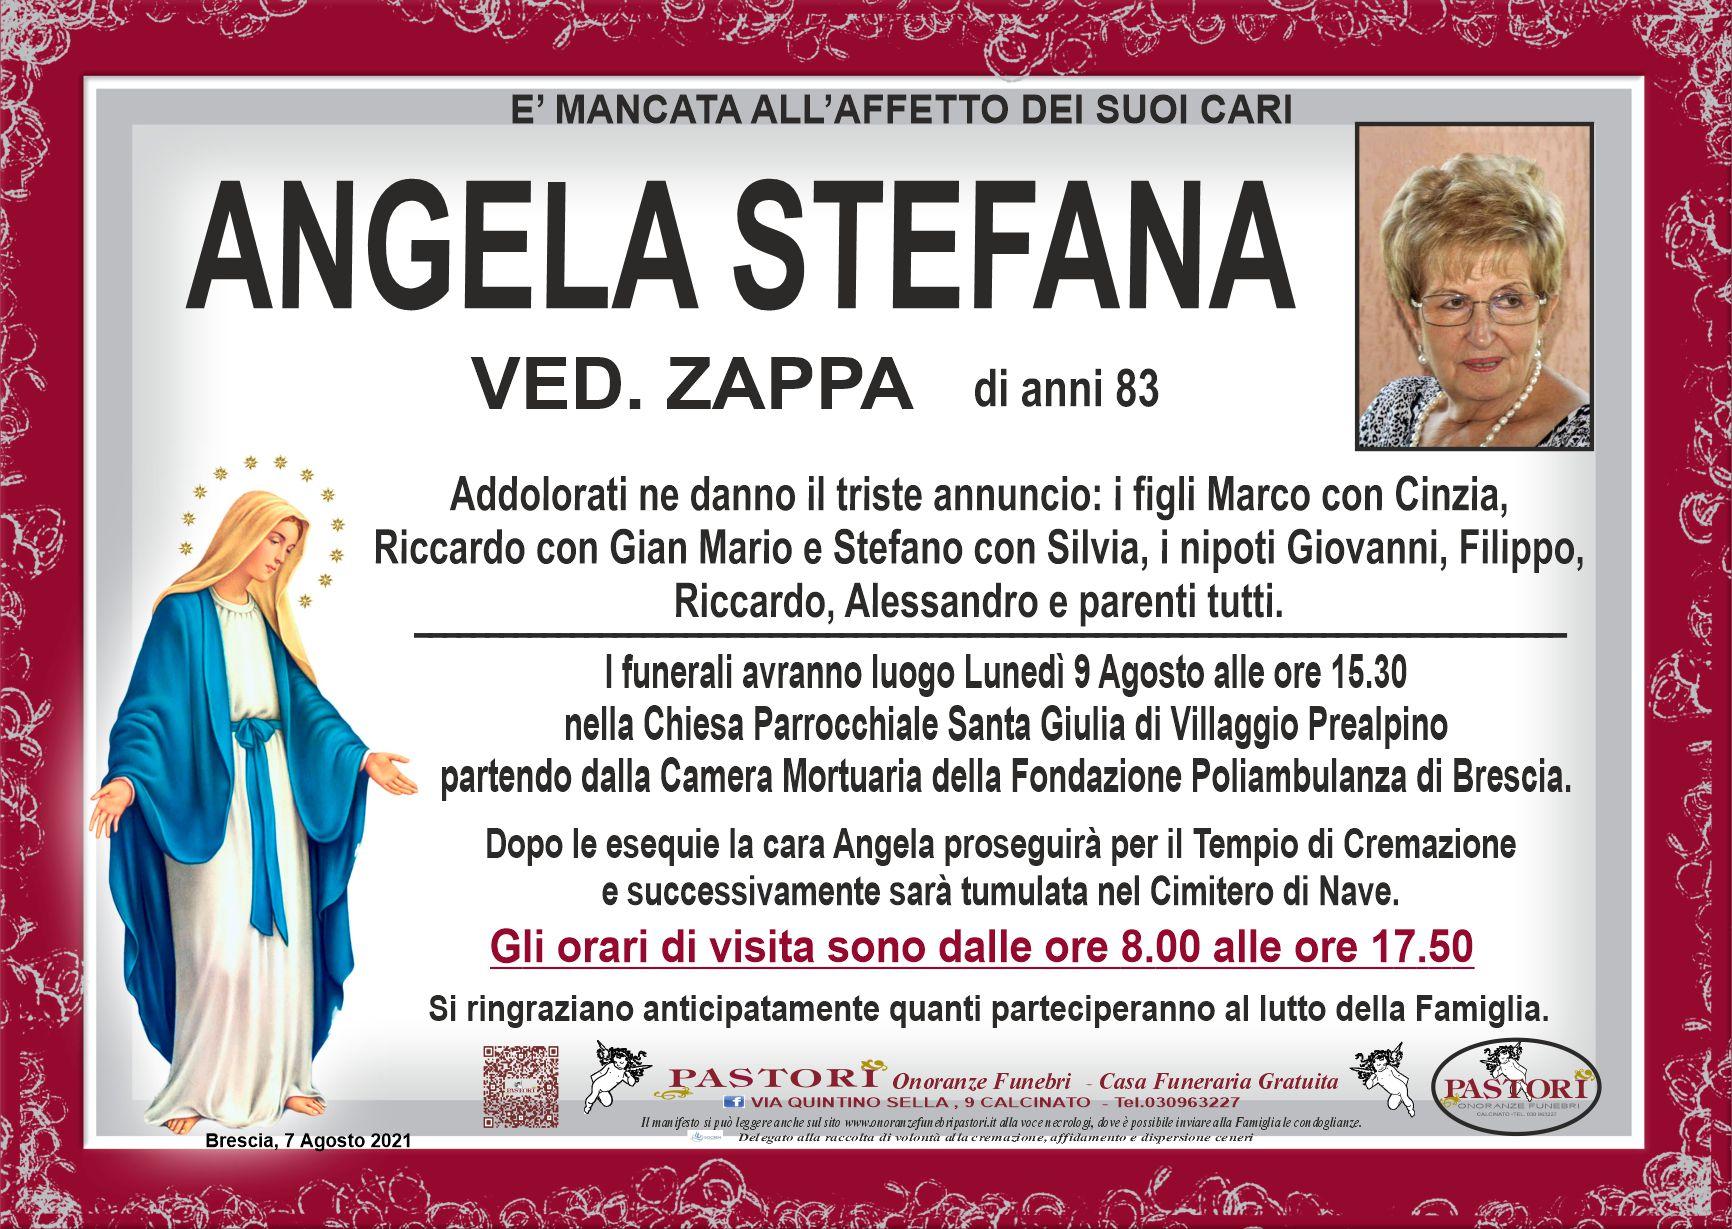 Angela Stefana